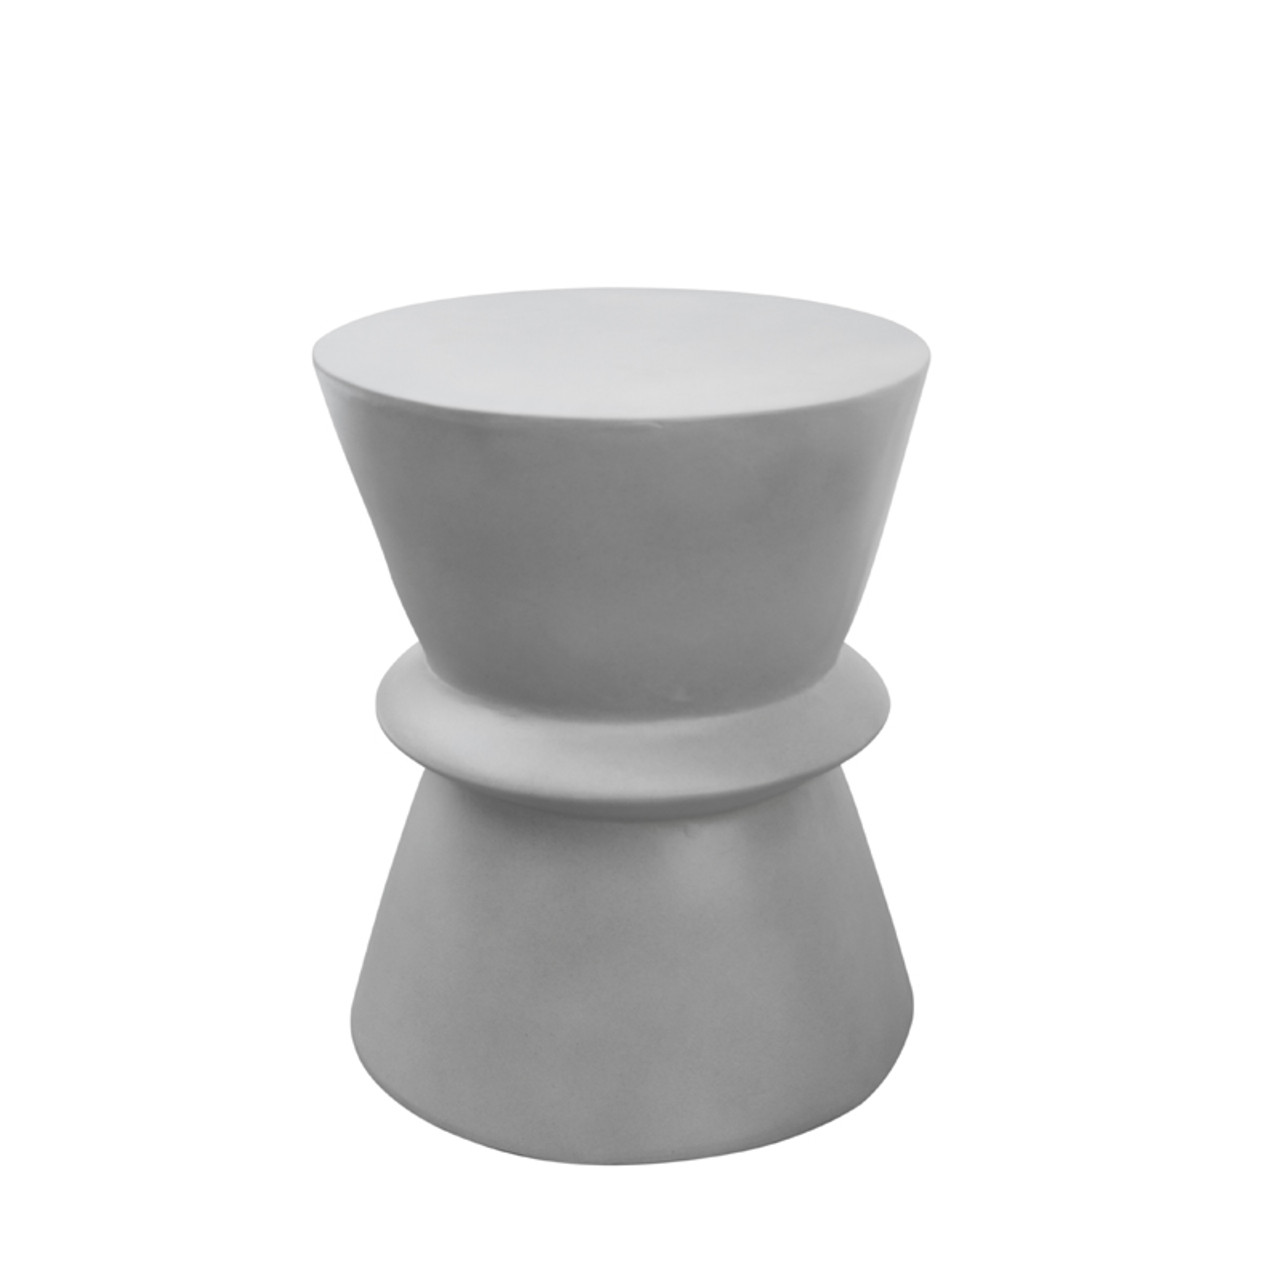 Modrest Ramos Modern Grey Concrete Round Stool Lounge La